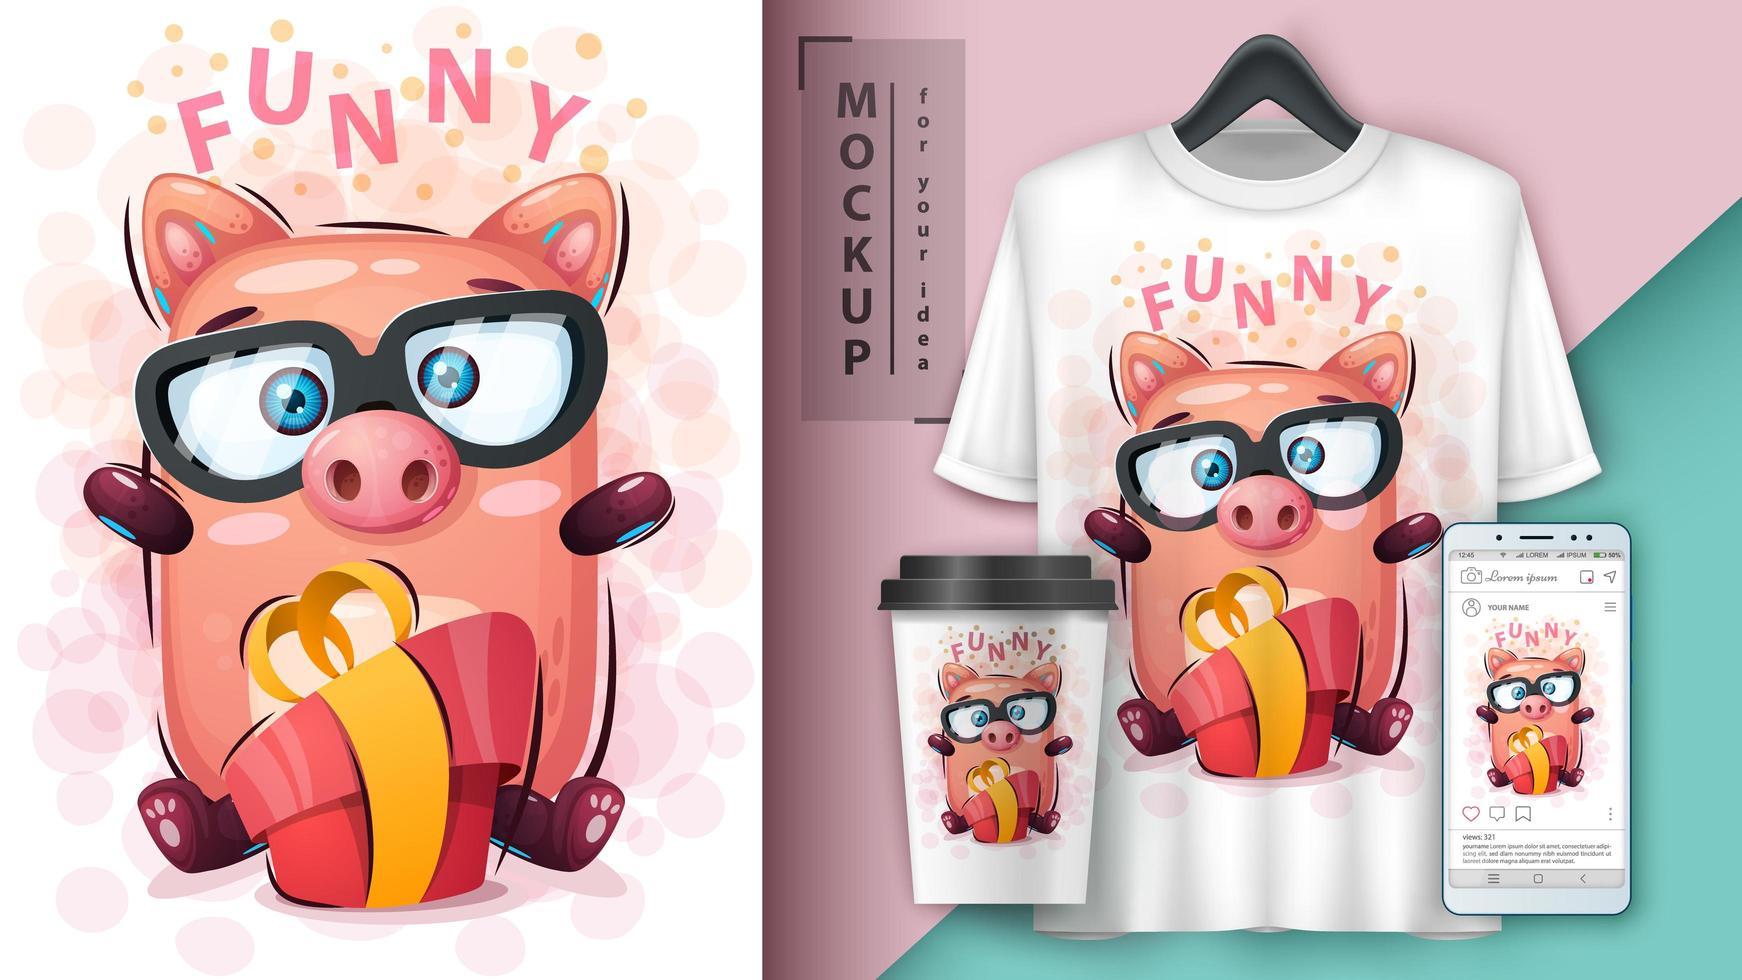 tecknad rolig gris med presentdesign vektor